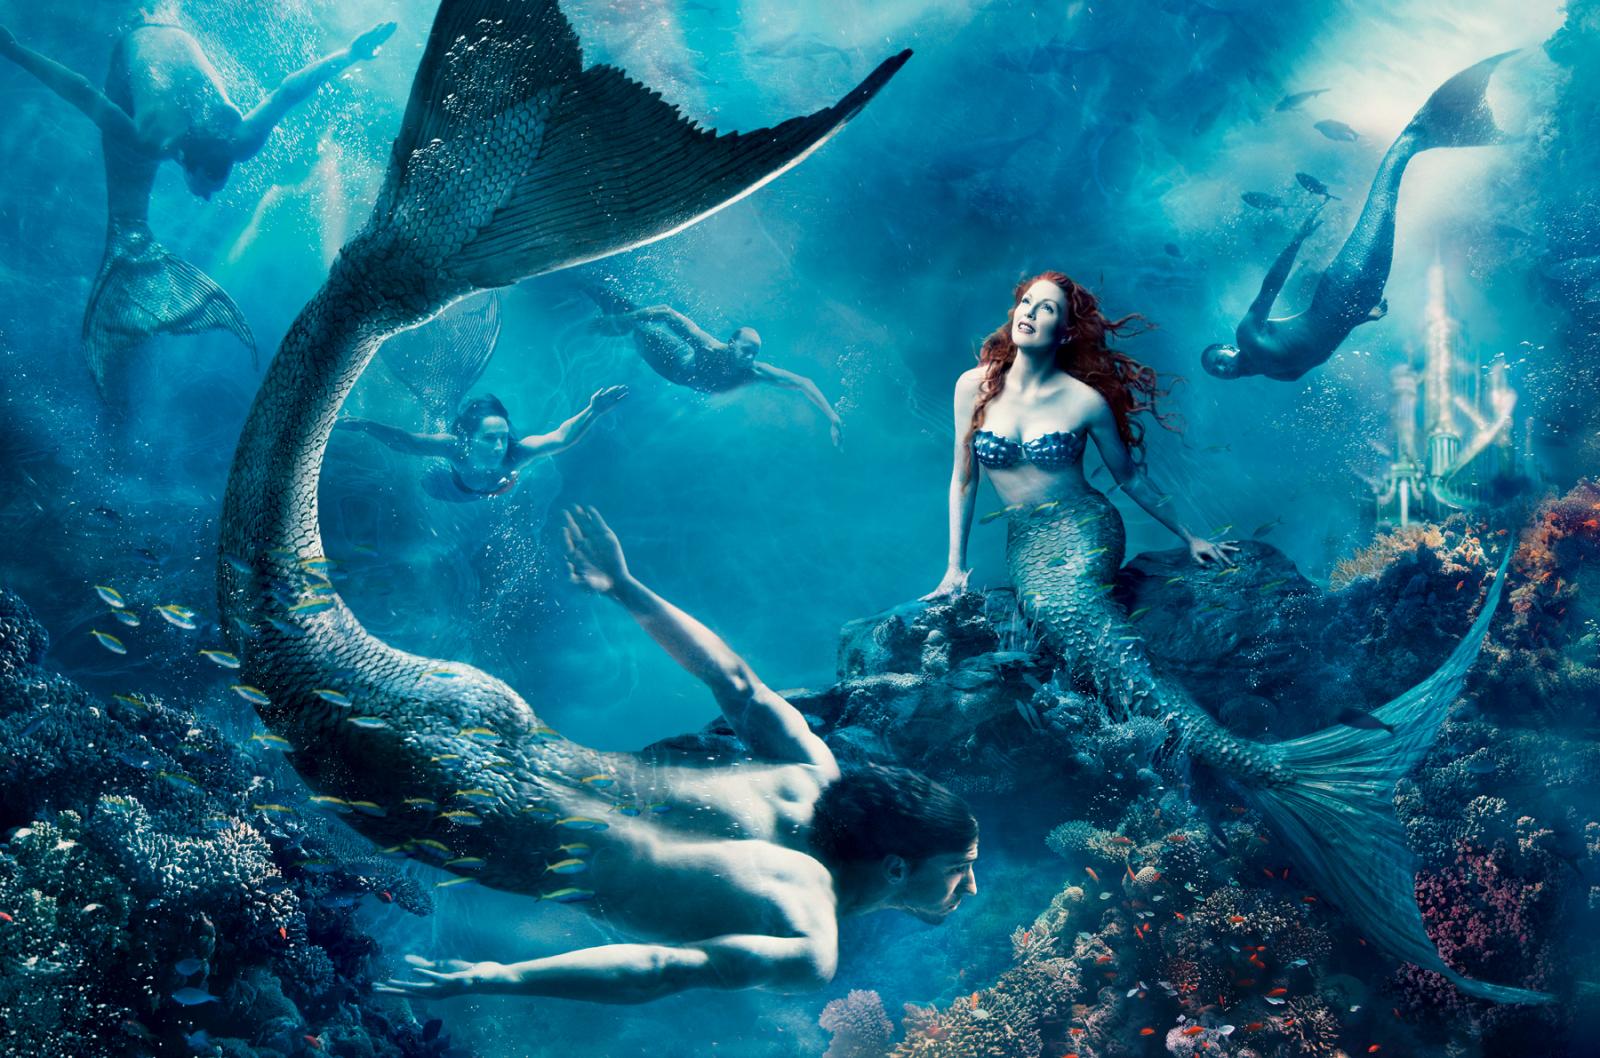 http://3.bp.blogspot.com/_vvDWoG_XX-0/TQn2Fd_eZLI/AAAAAAAABGM/YNnqRYHlmiA/s1600/The-Little-Mermaid-annie-leibovitz-1518887-1600-1058.jpg